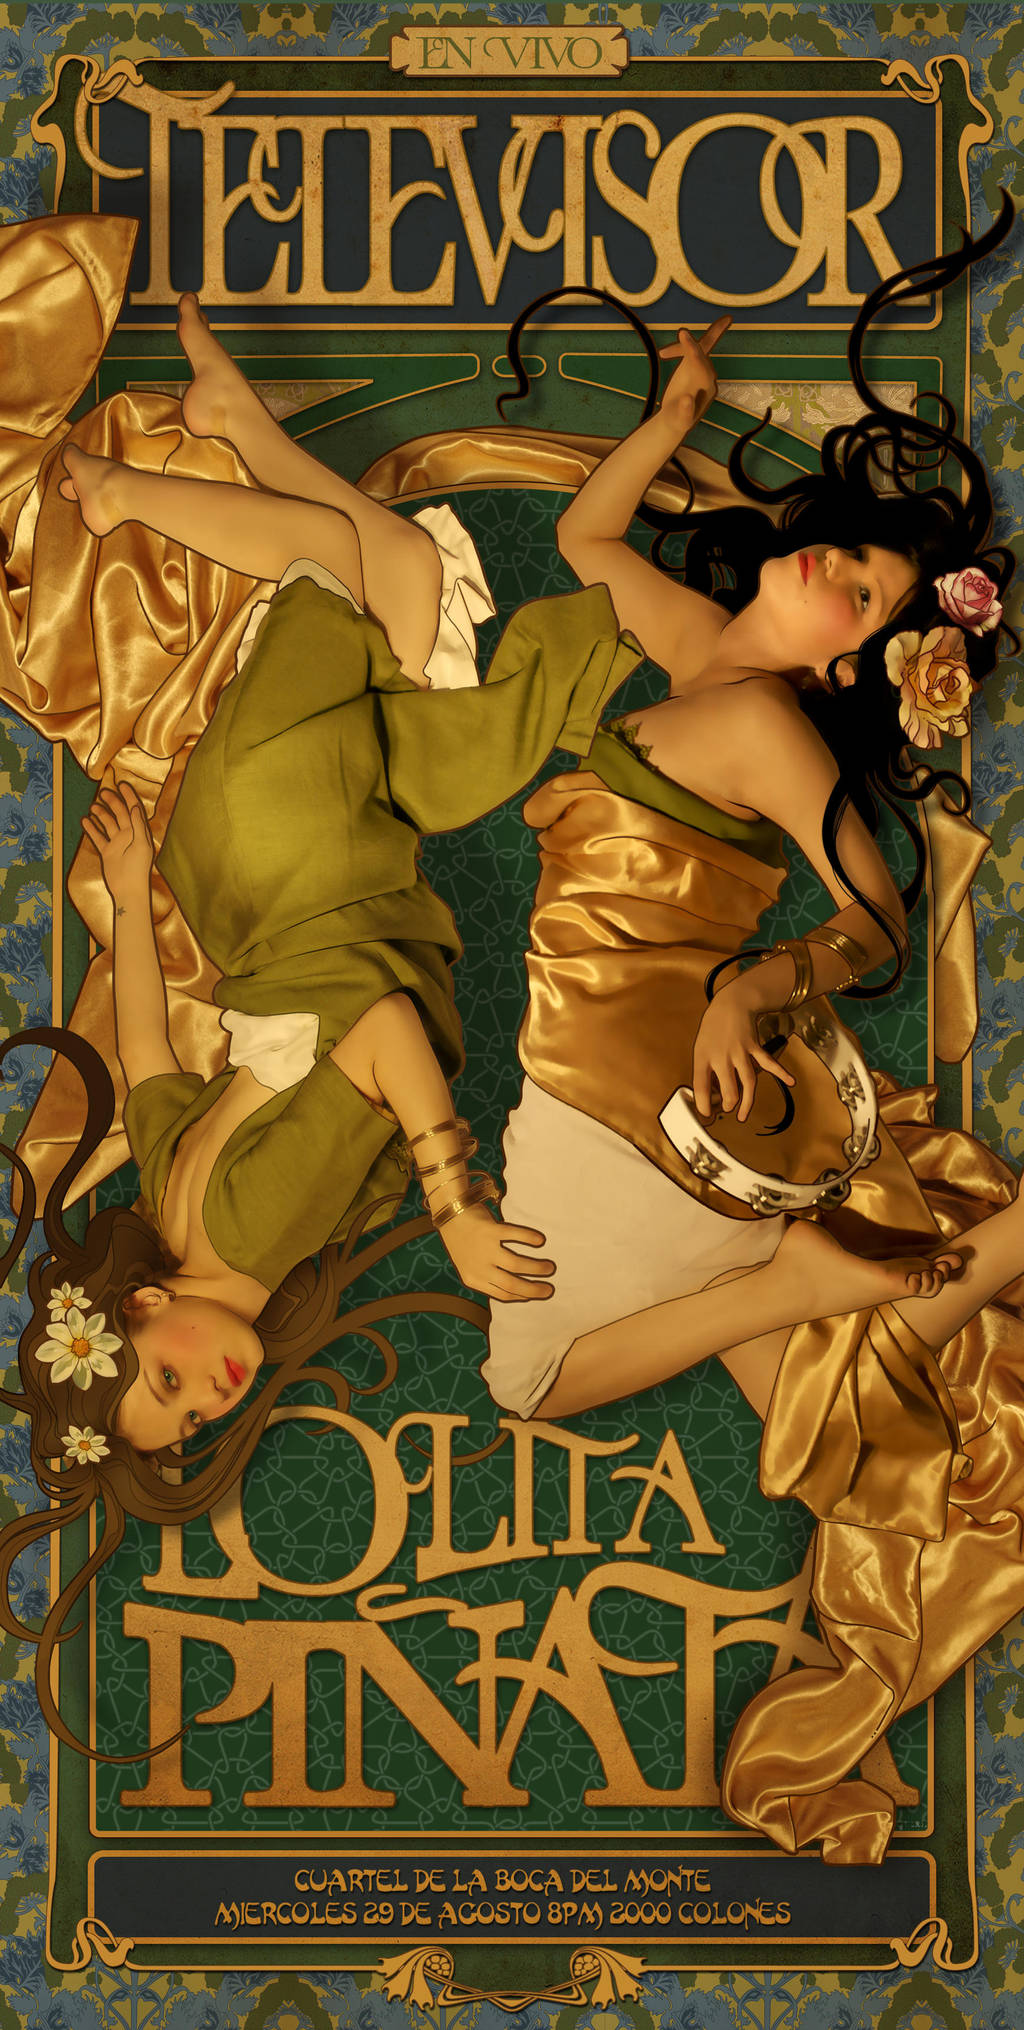 Lolita Pinata y Televisor by lasirenita